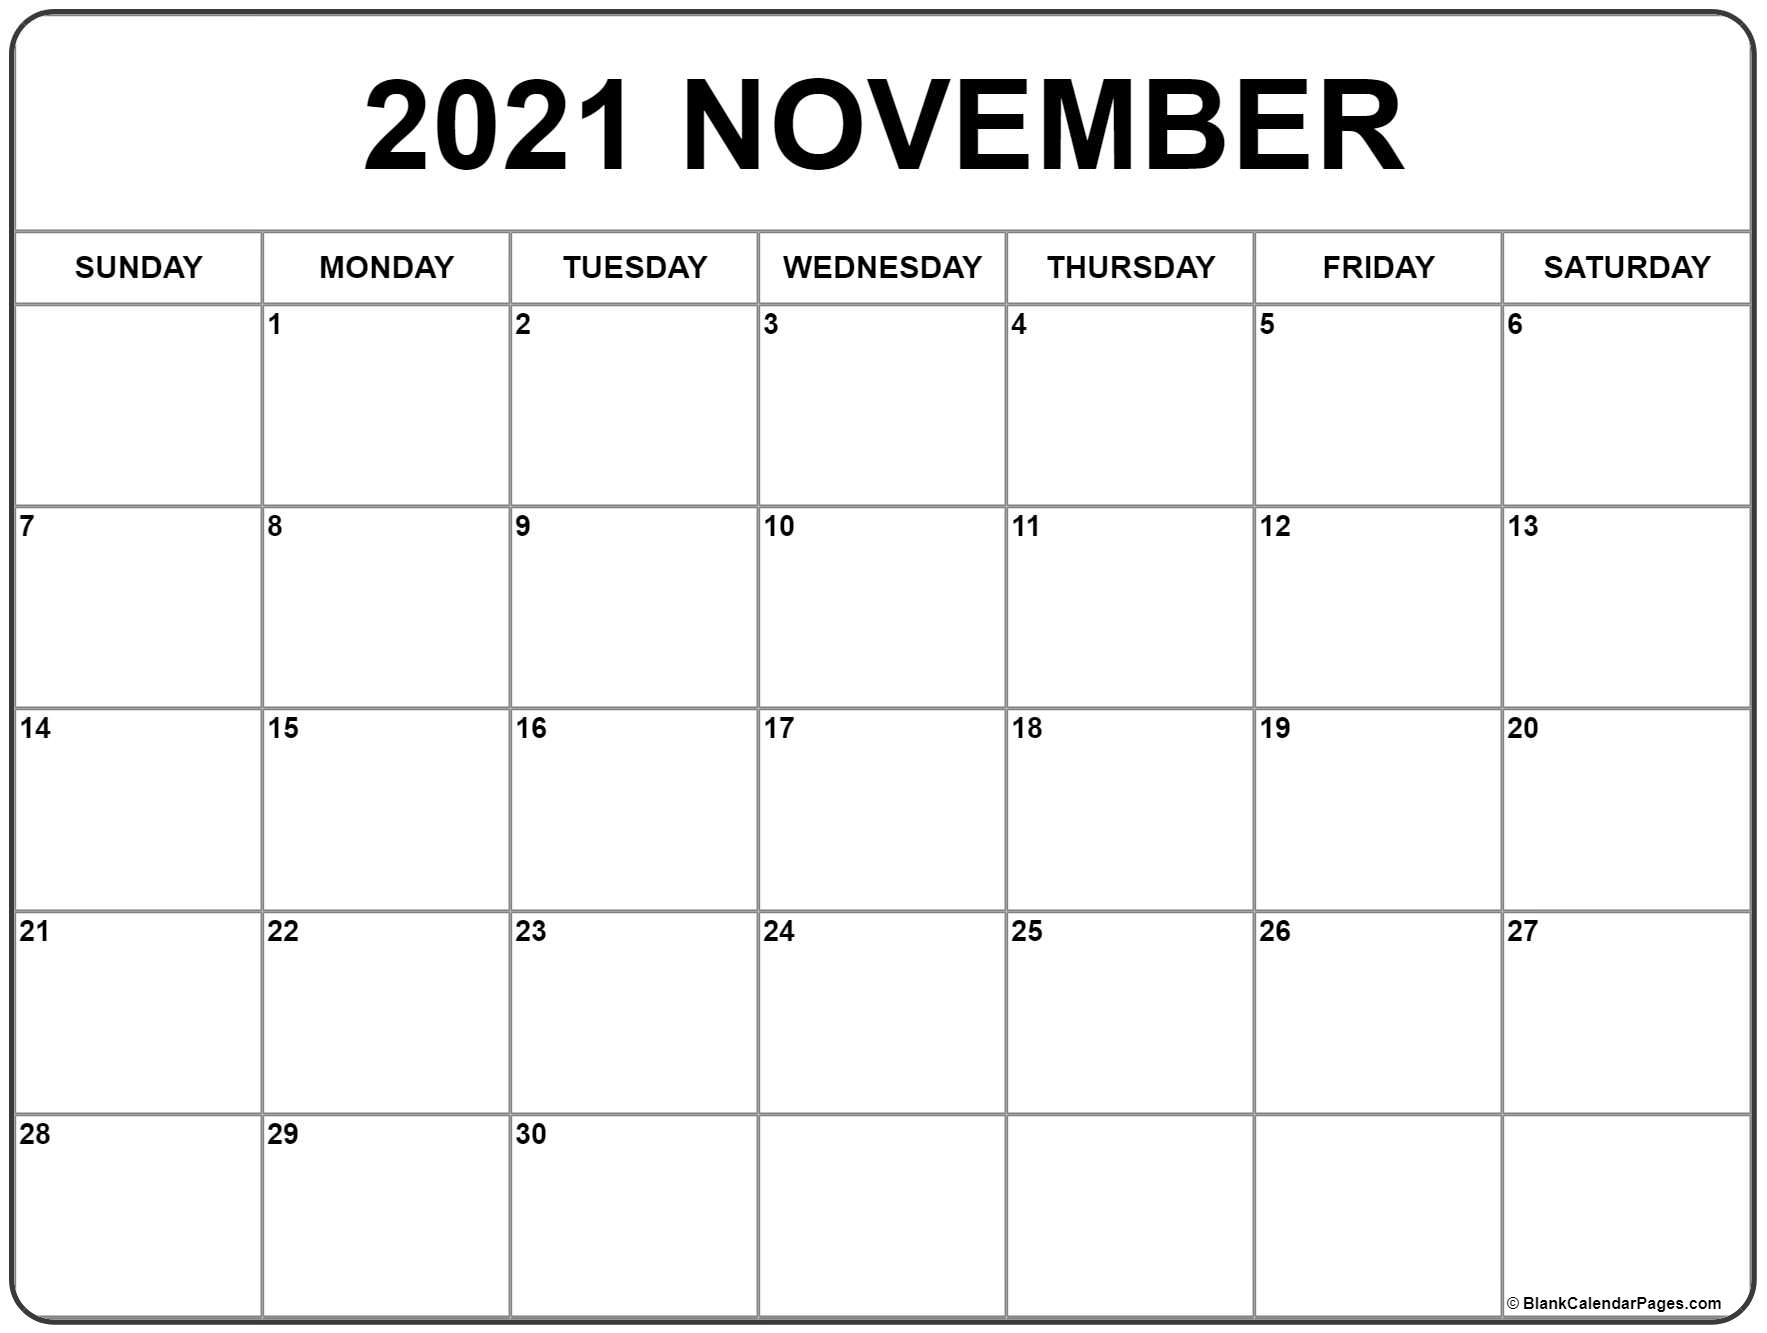 November 2021 Calendar | Free Printable Monthly Calendars in Calendar With November 2021 Mexican Names